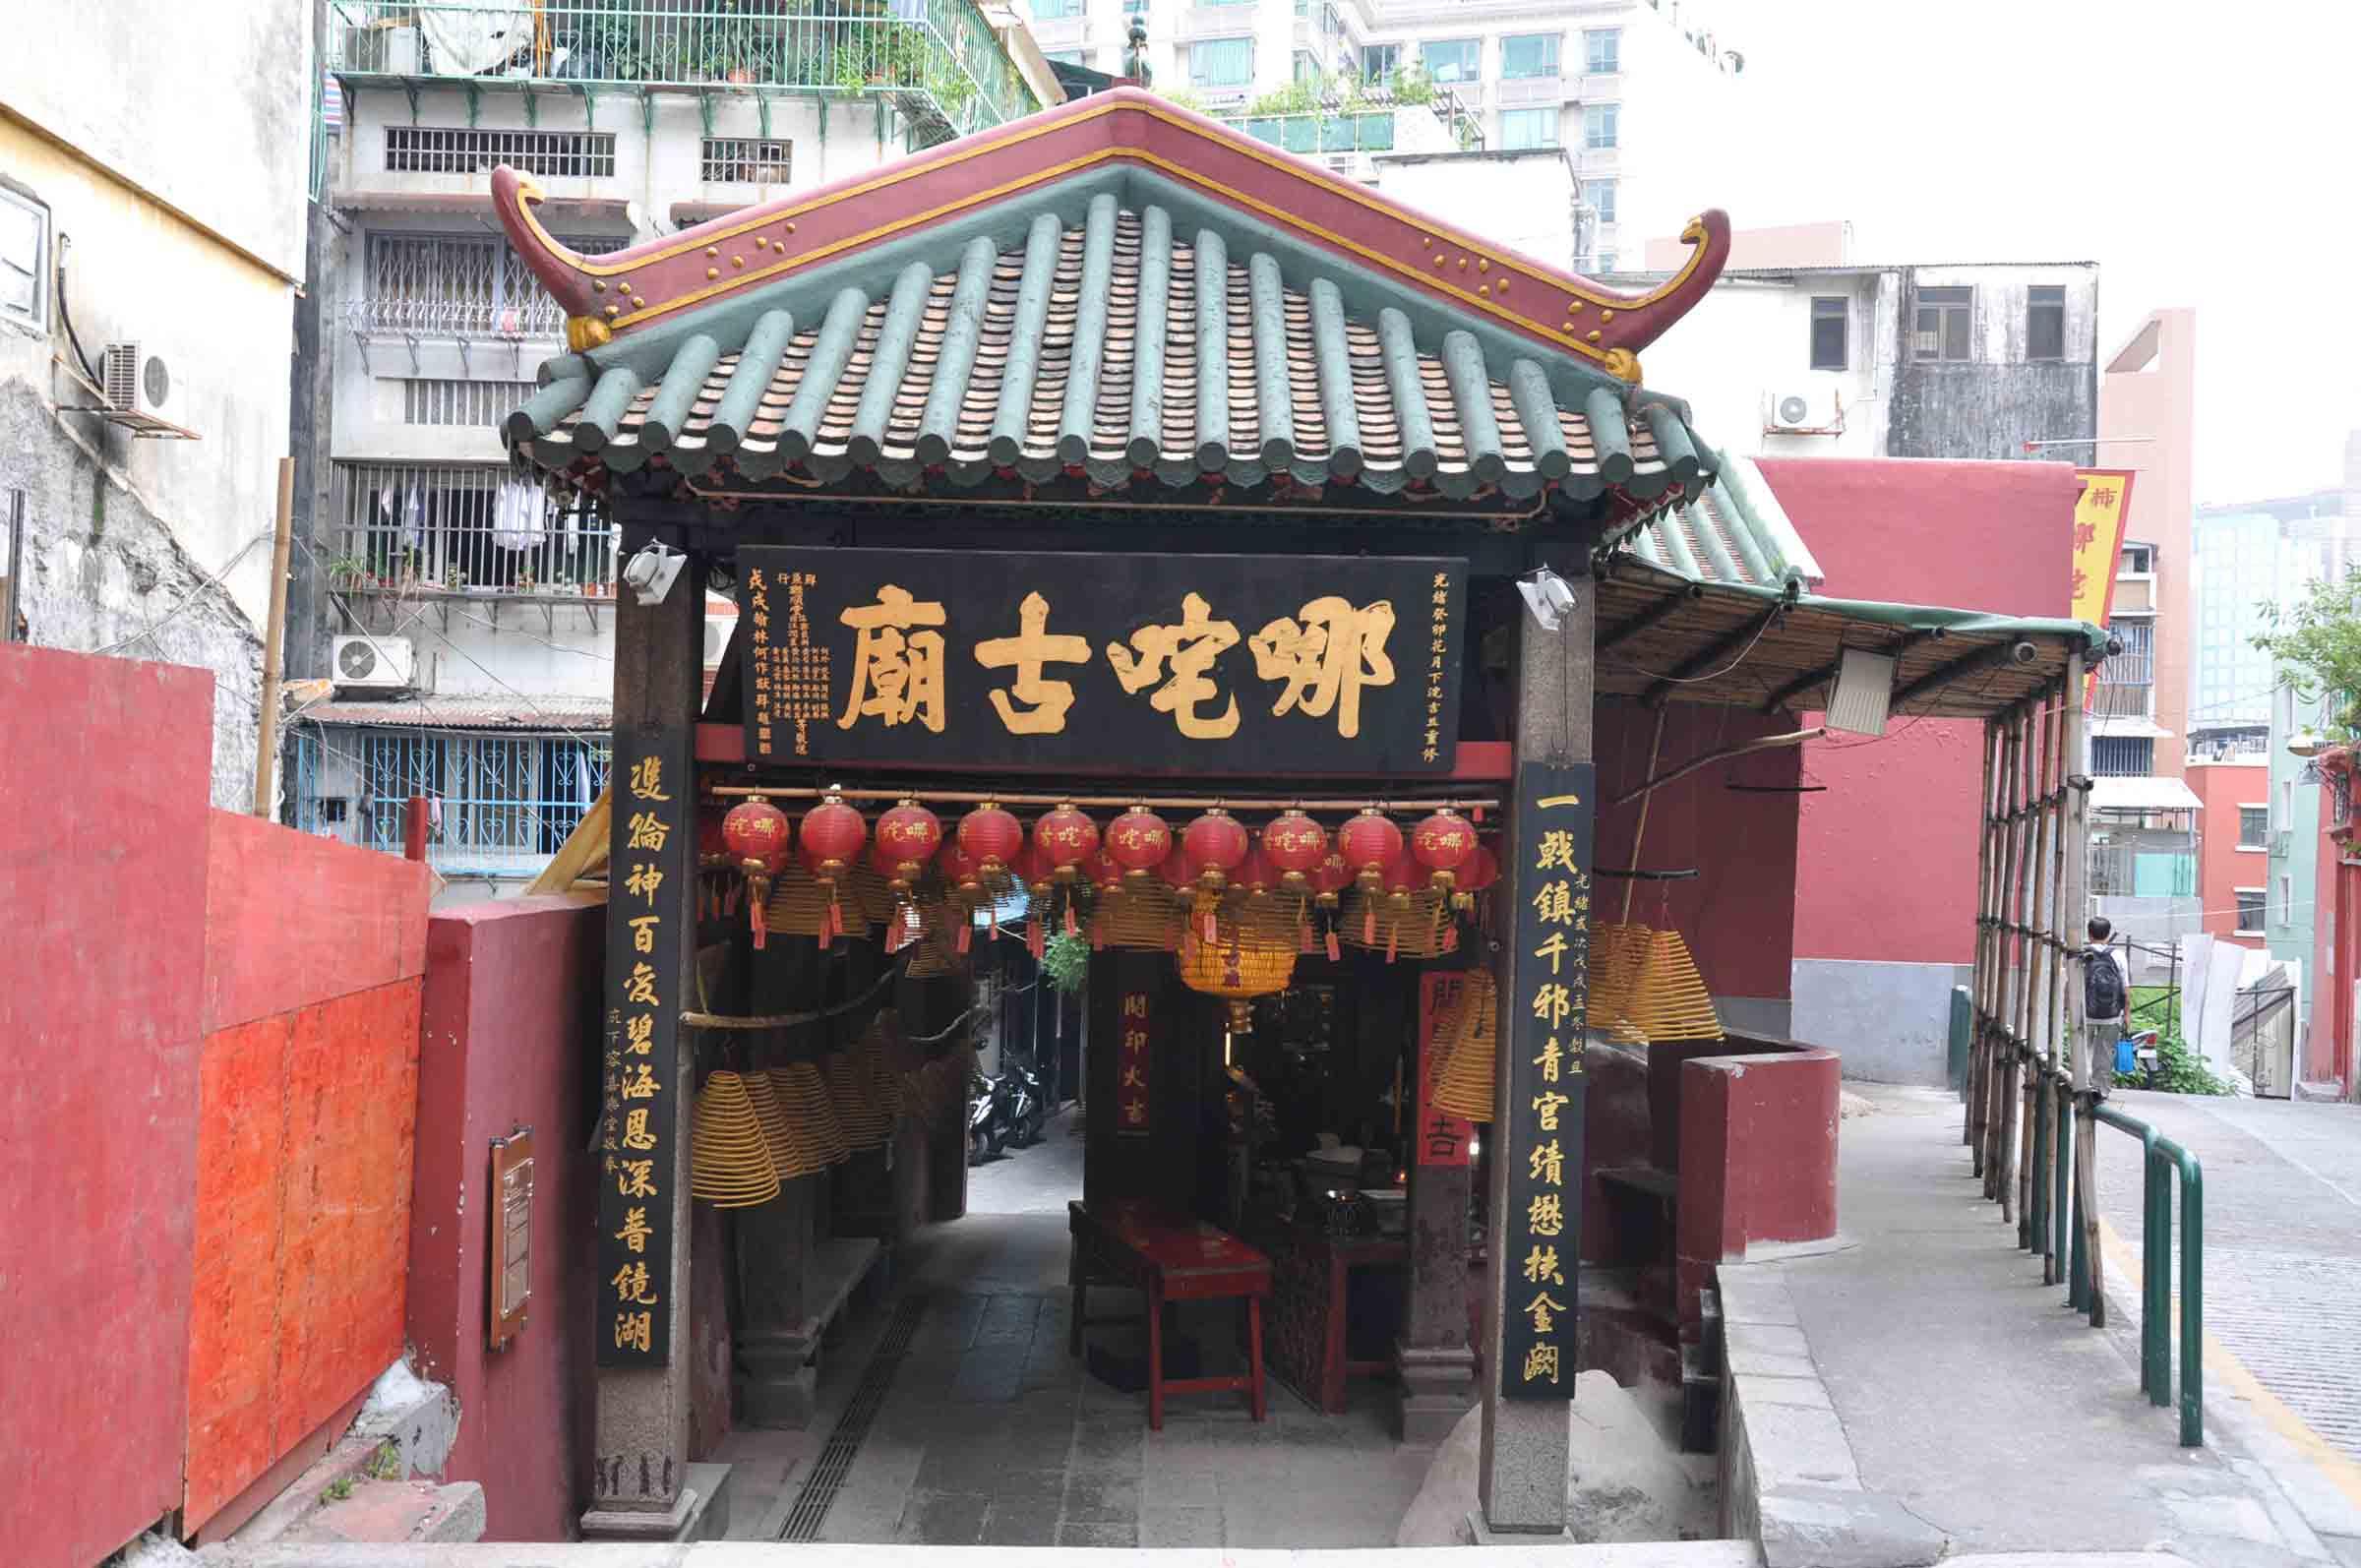 Macau Temples: Na Tcha Temple